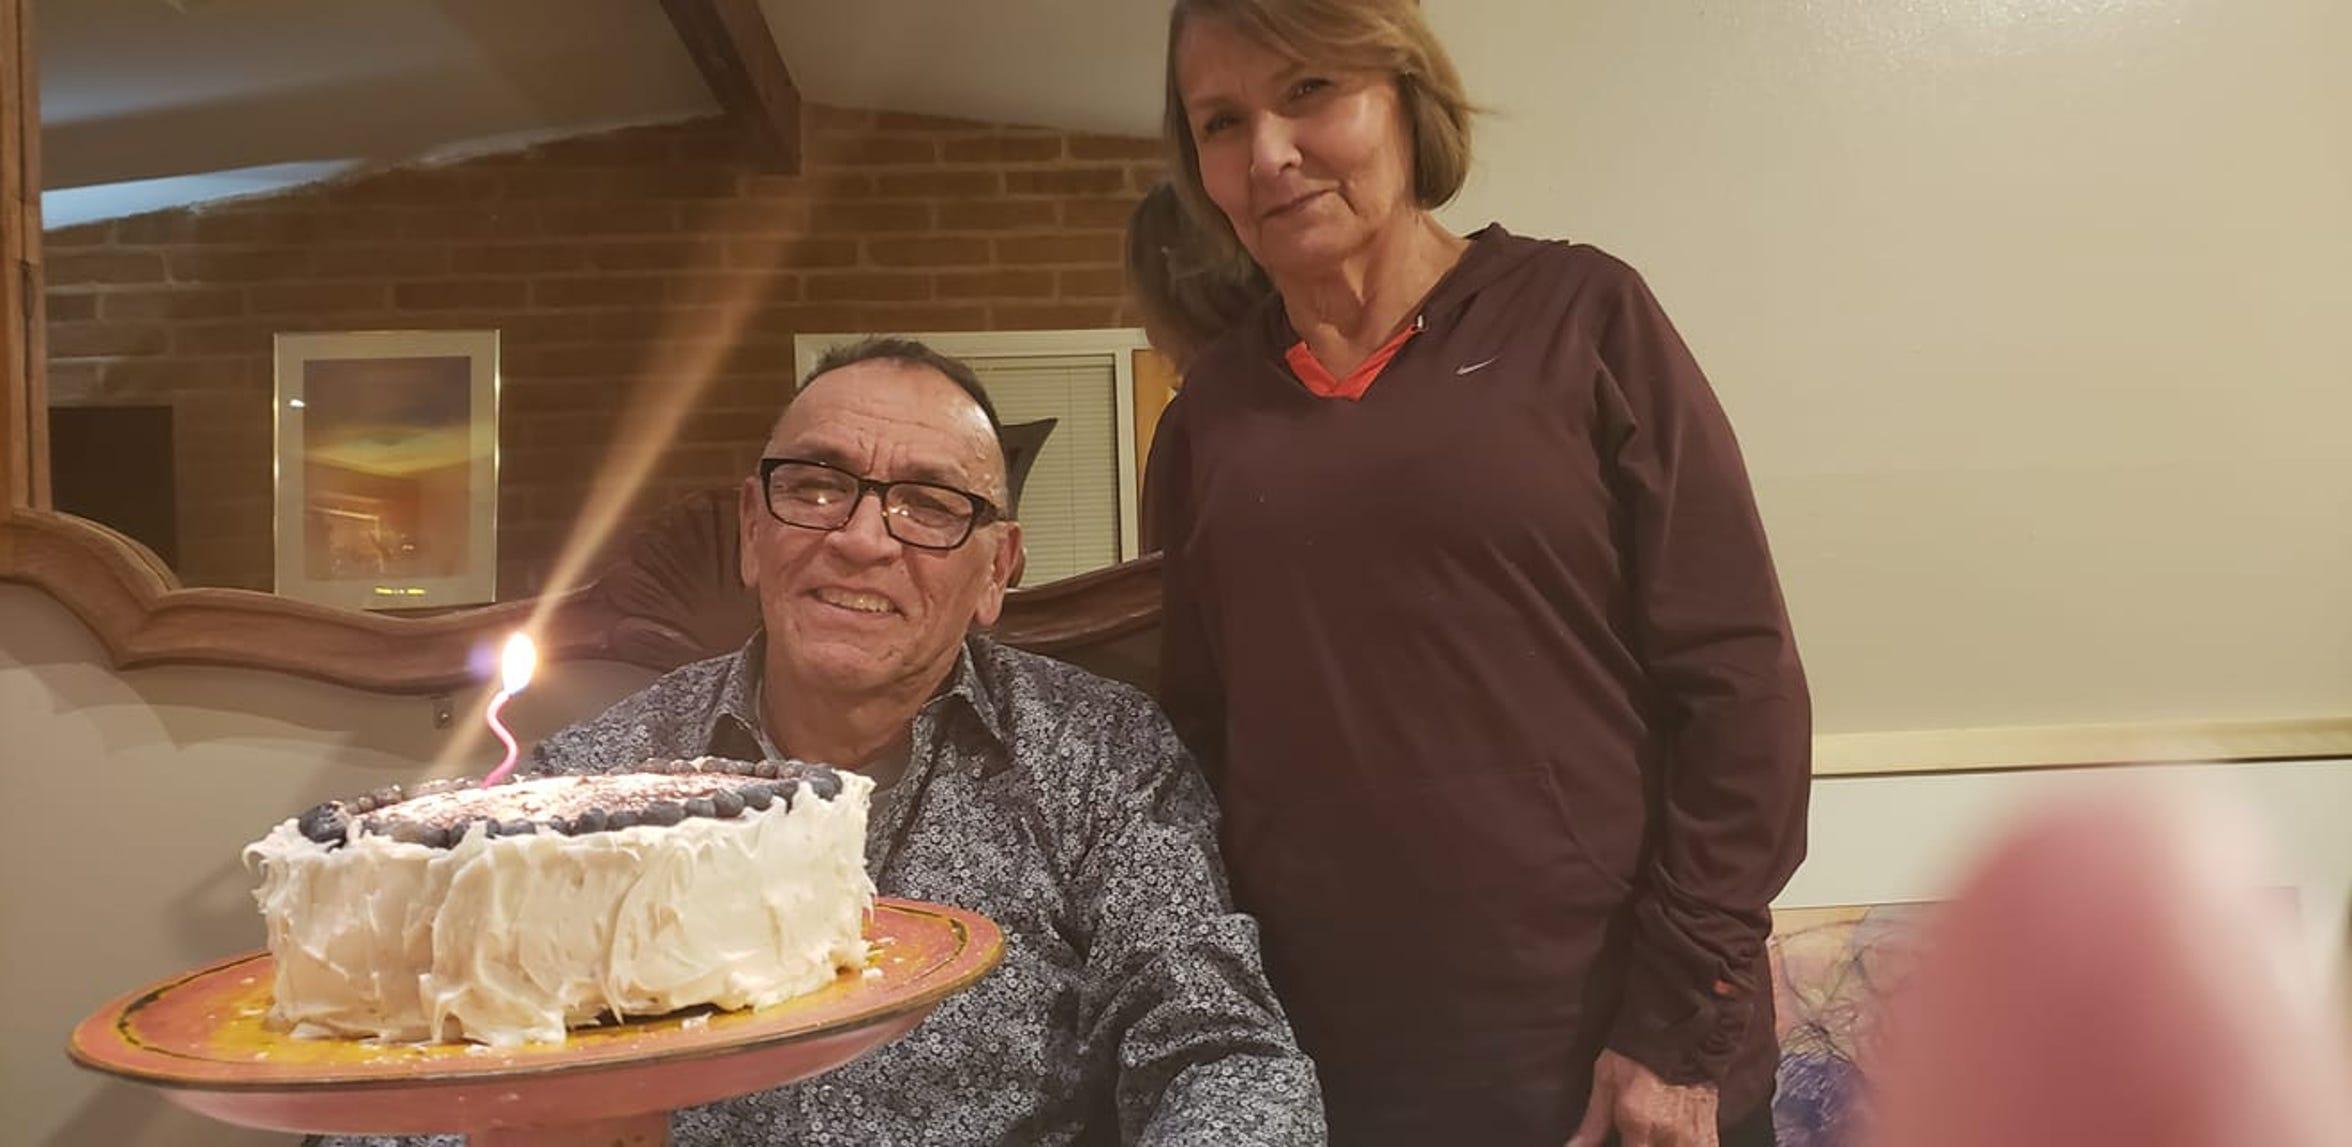 John Bird, a member of the Blackfeet Nation, lives in Tucson, Arizona with his sister, Barbara. He fears the coronavirus will hurt the Blackfeet Nation as it has the Navajo.